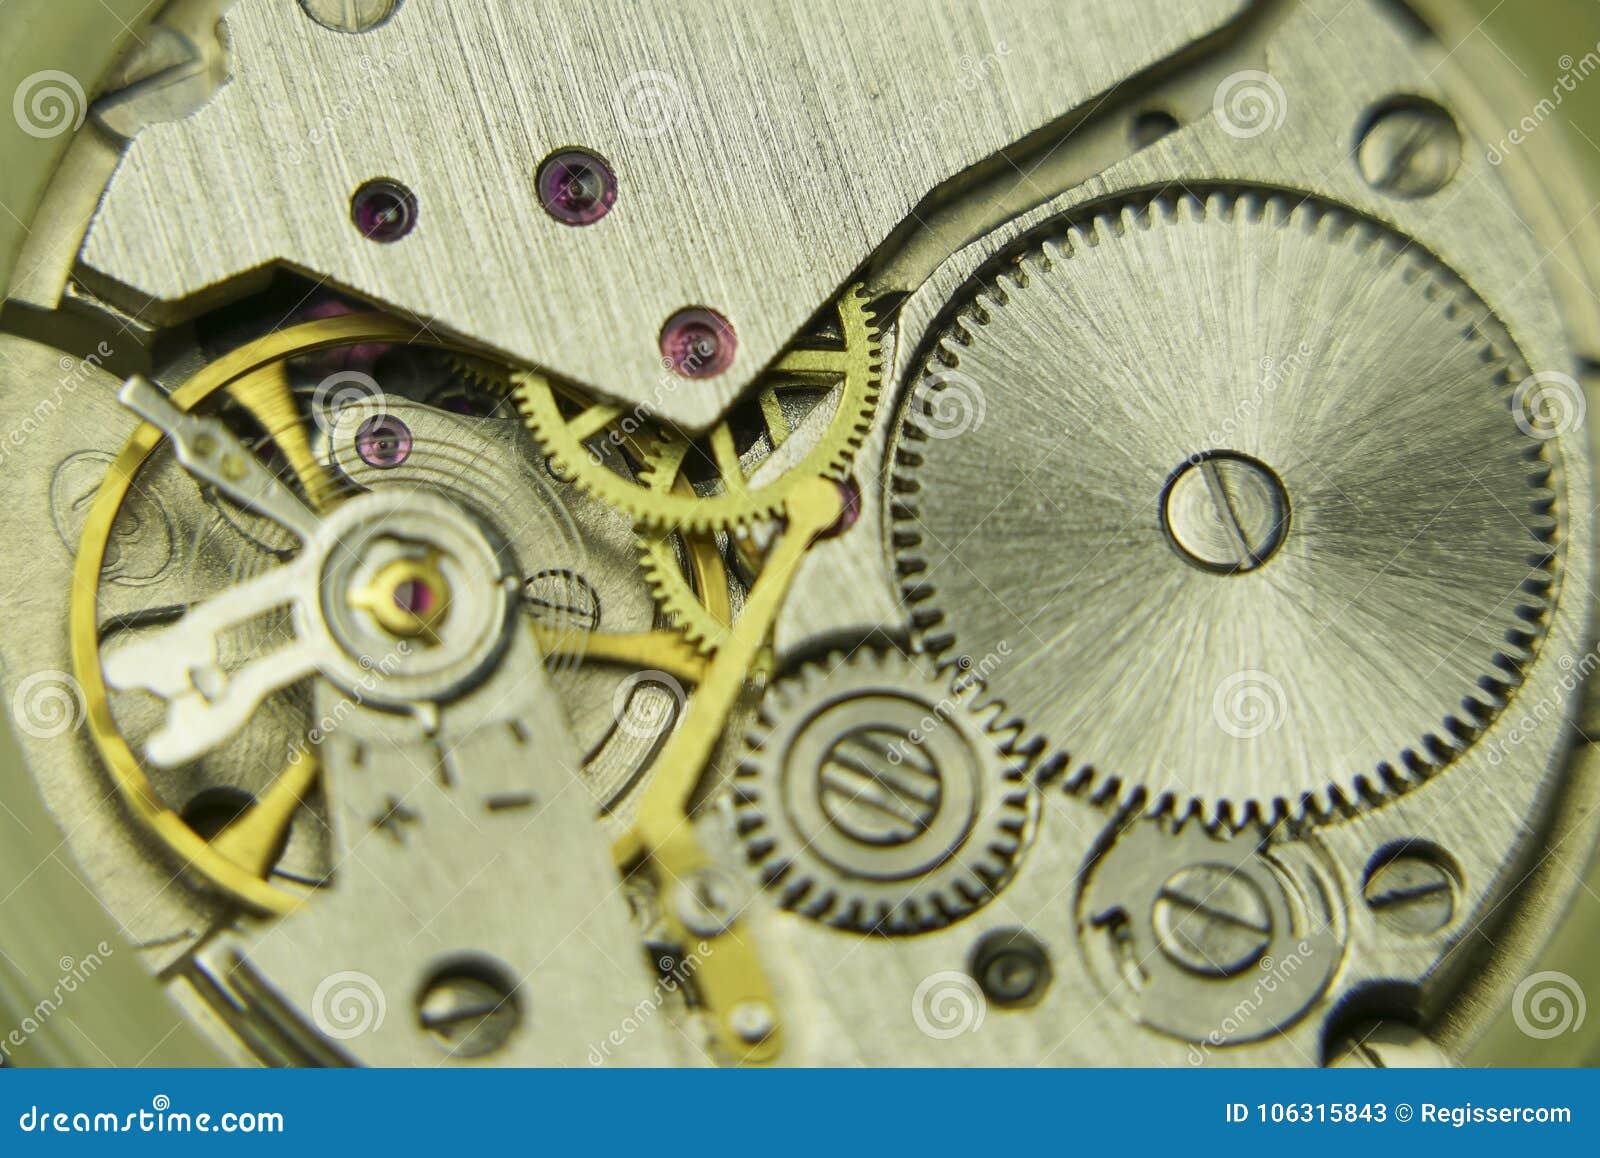 Gammalt mekaniskt klockamekanismslut upp